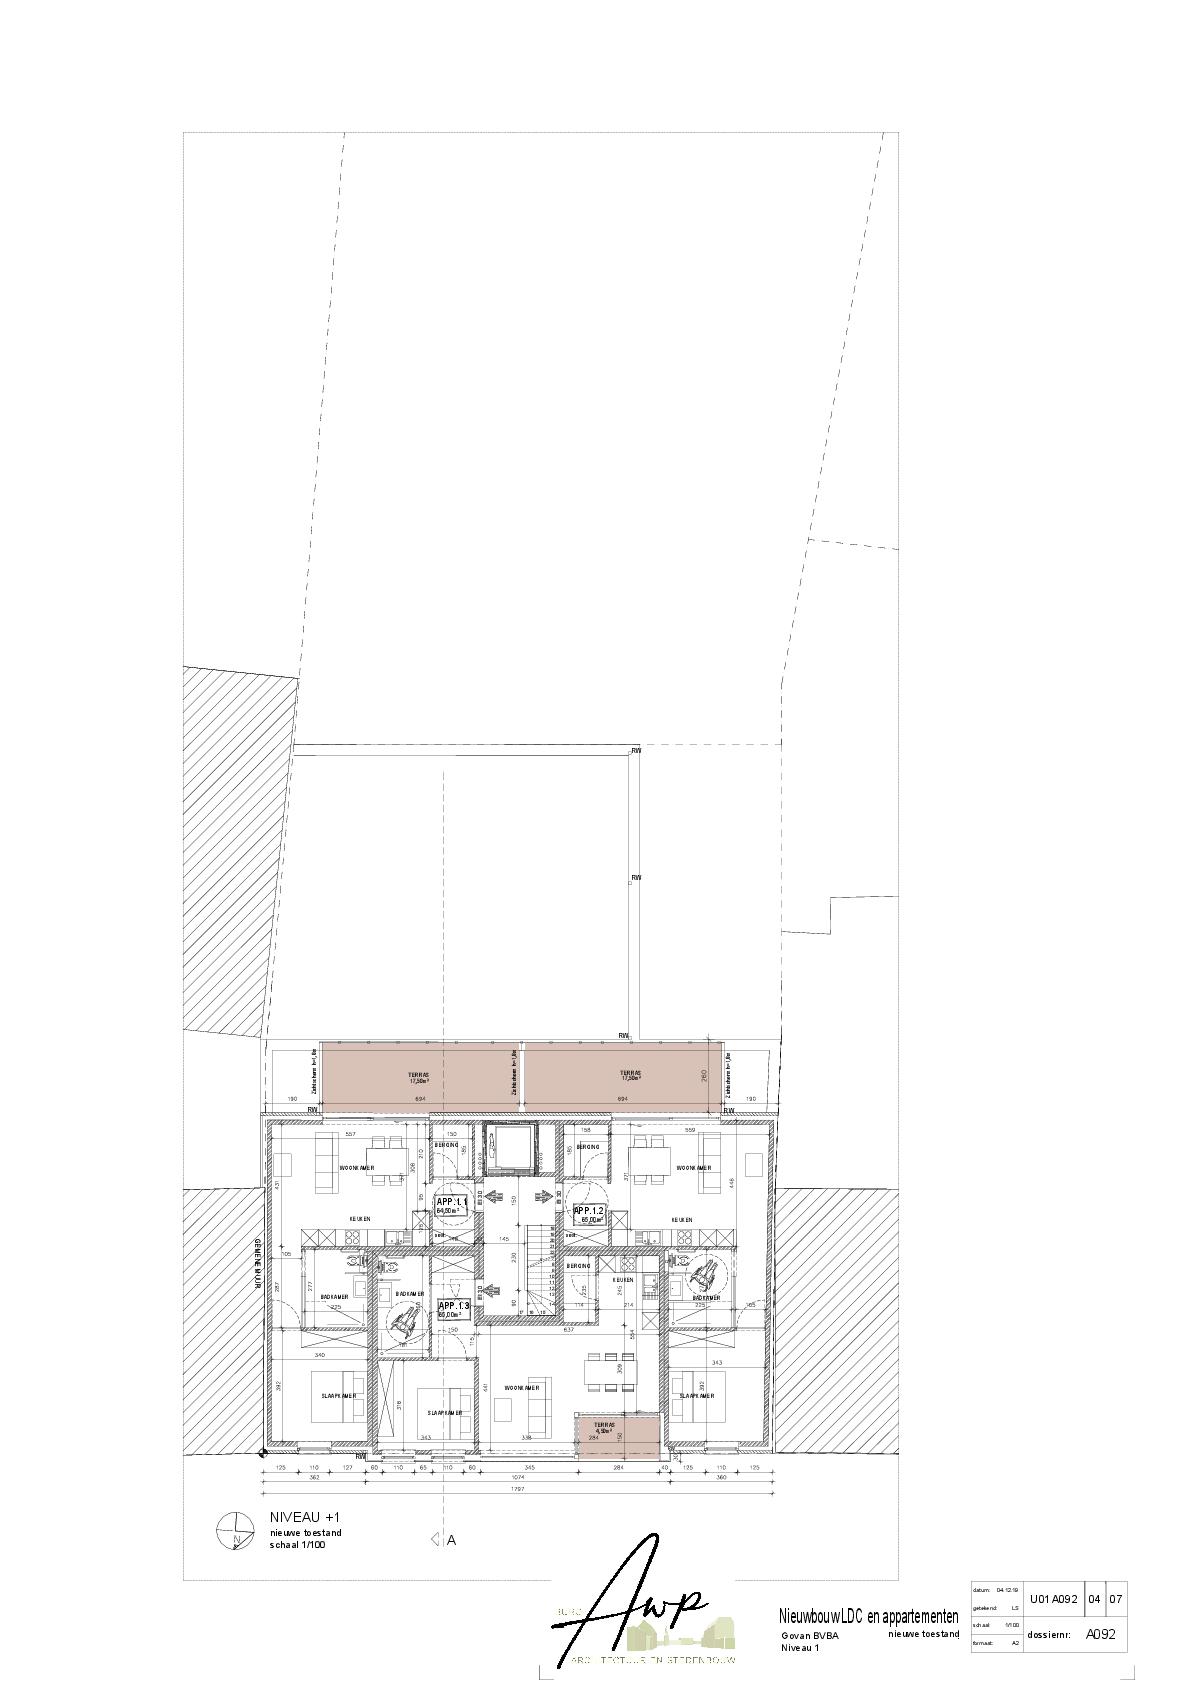 grondplan1.pdf